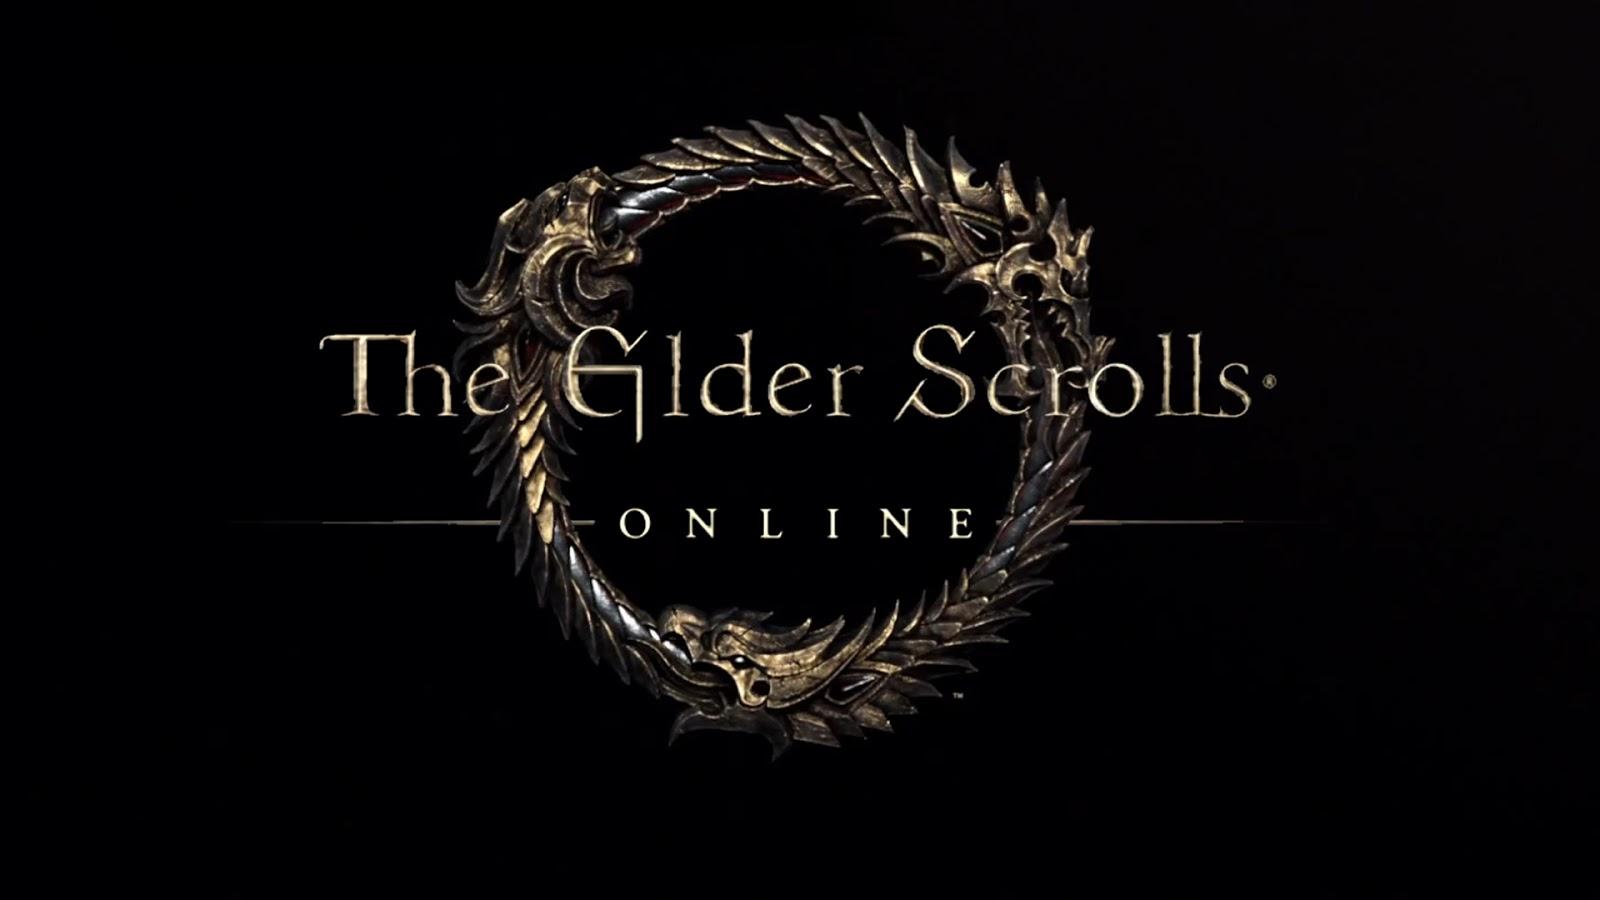 The elder scrolls online release date xbox one